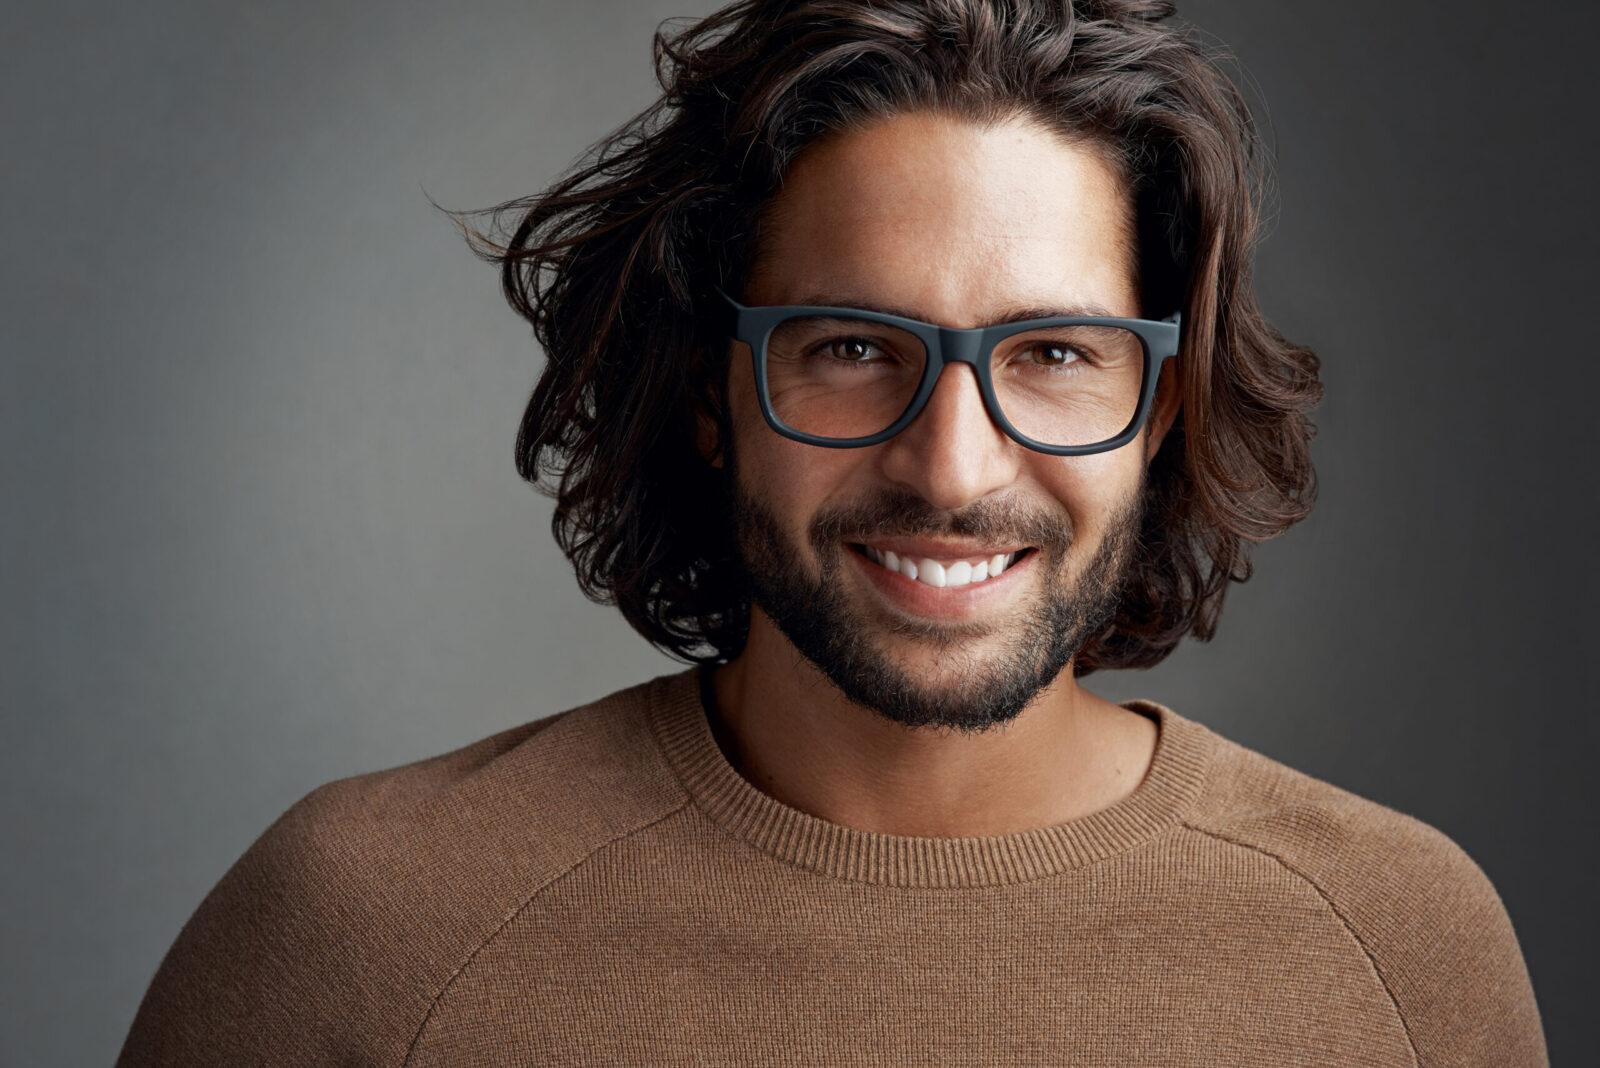 Men's chin length bob